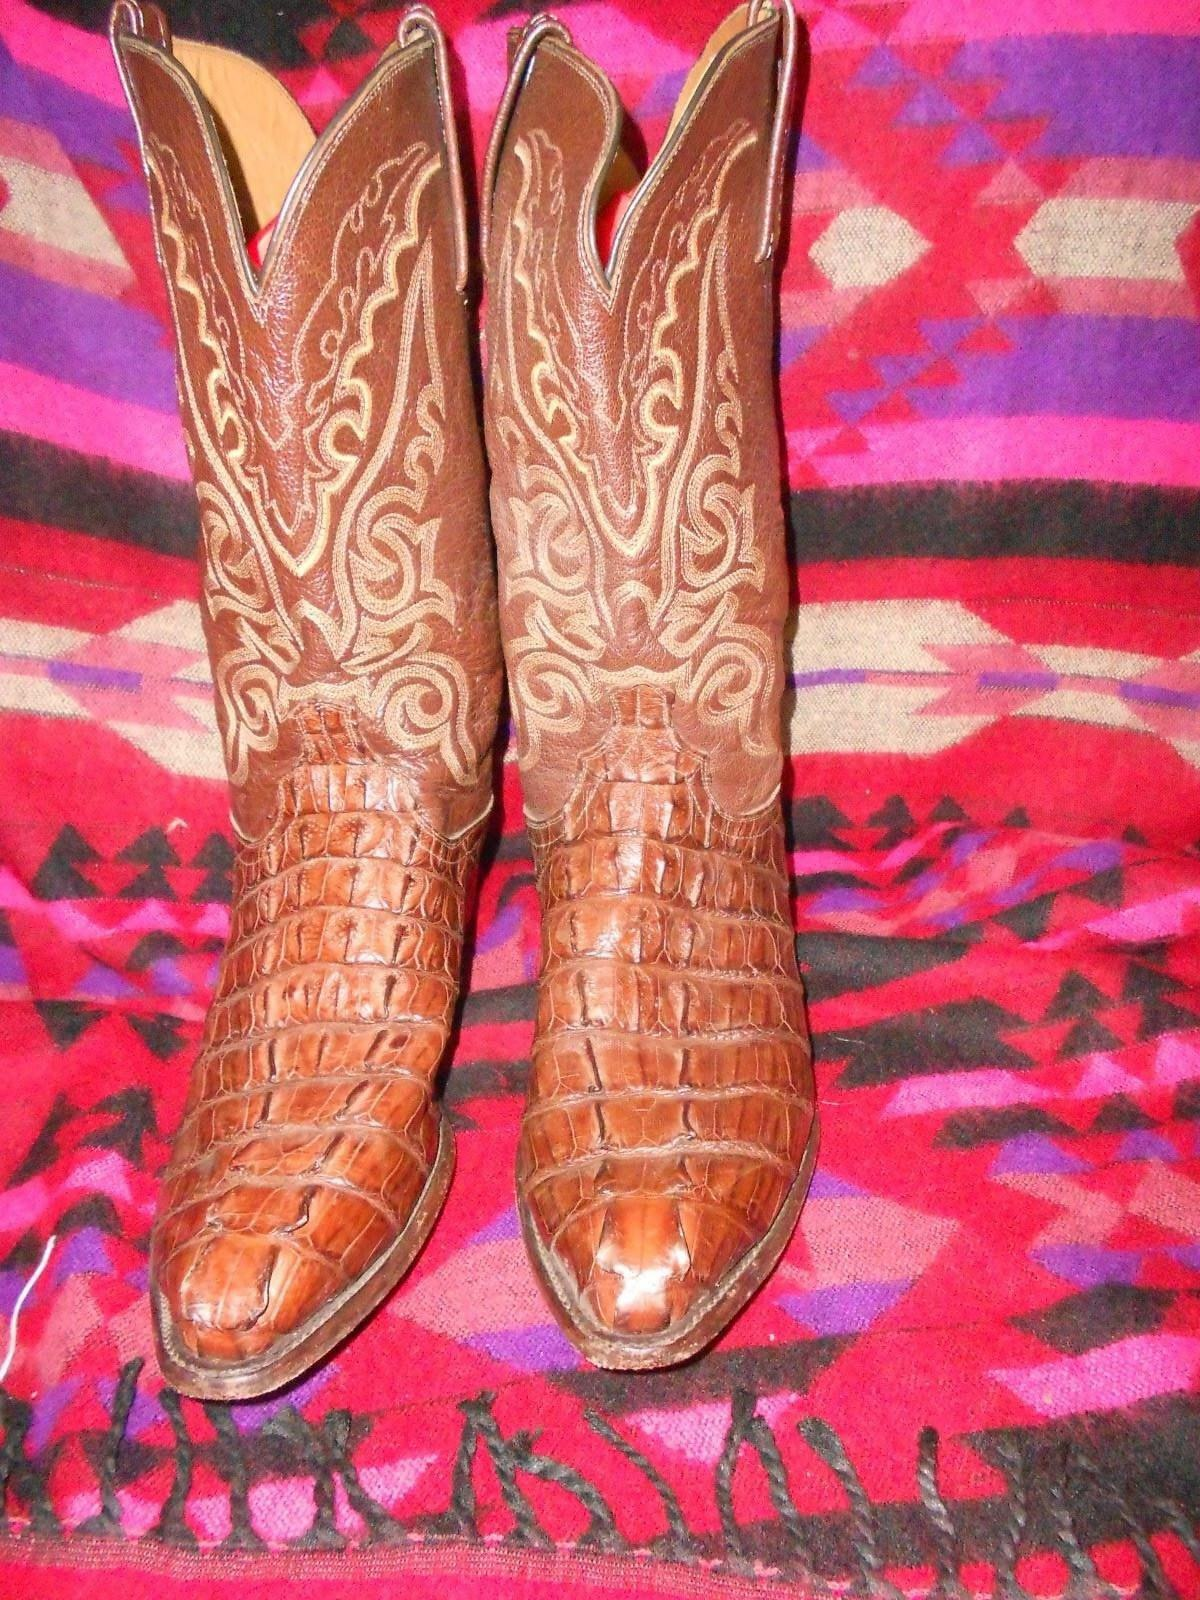 Luchese 2000 realizzati a mano Stivali Cowboy Western